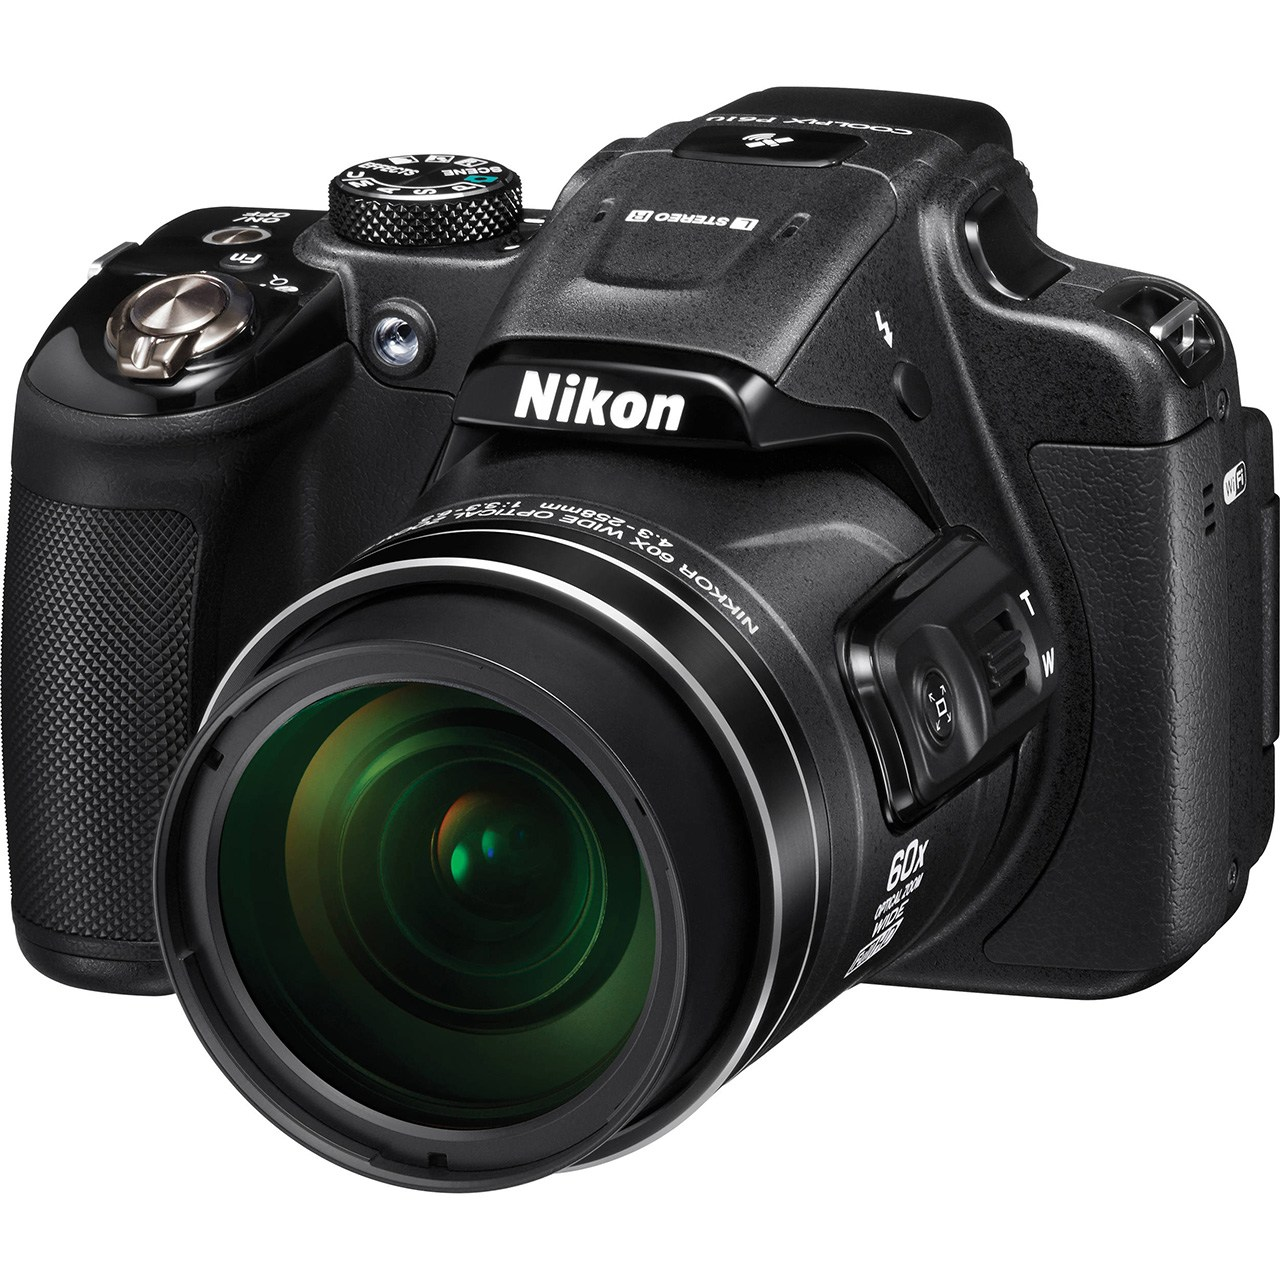 دوربين ديجيتال نيکون مدل Nikon Coolpix B700 Digital Camera